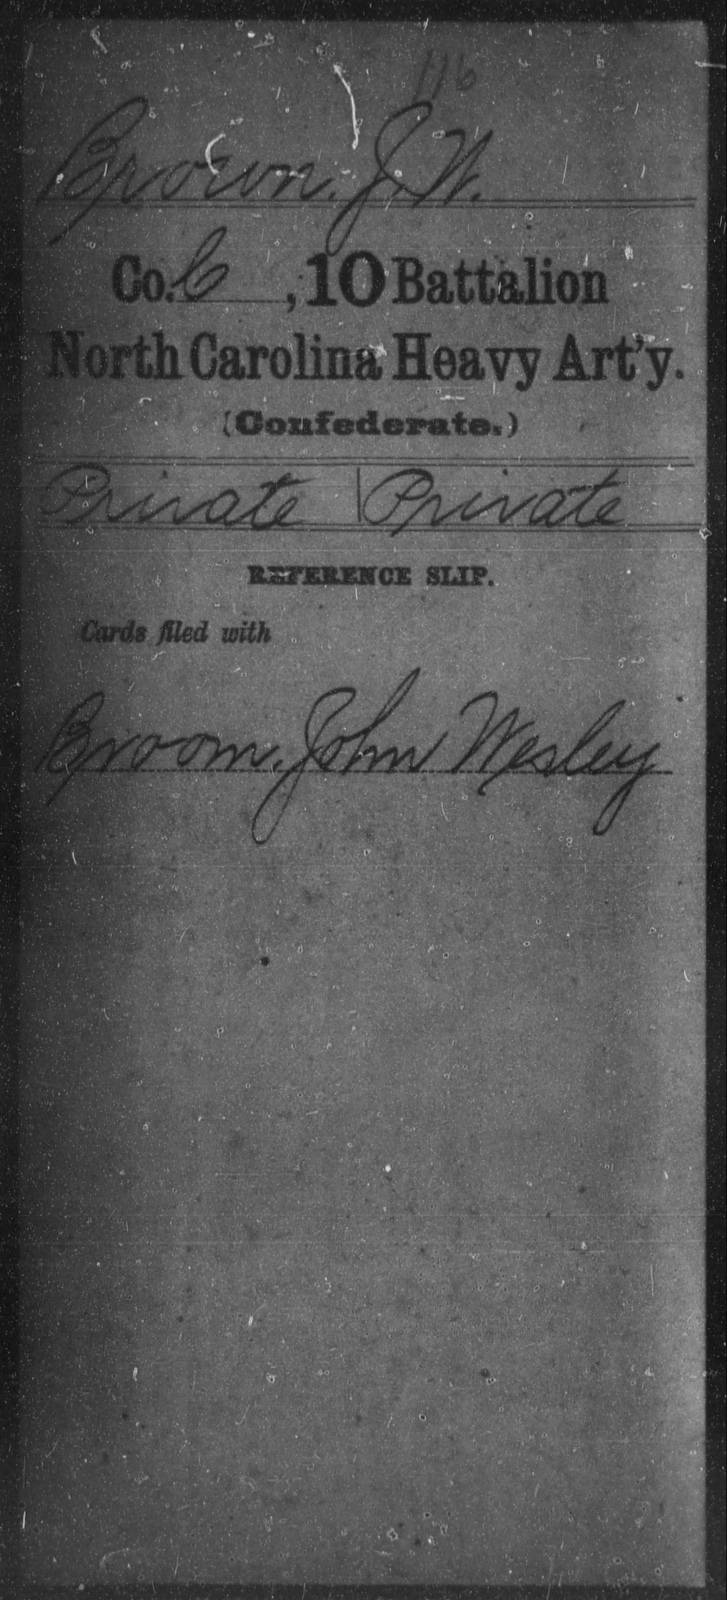 Brown, J W - Tenth Battalion, Heavy Artillery